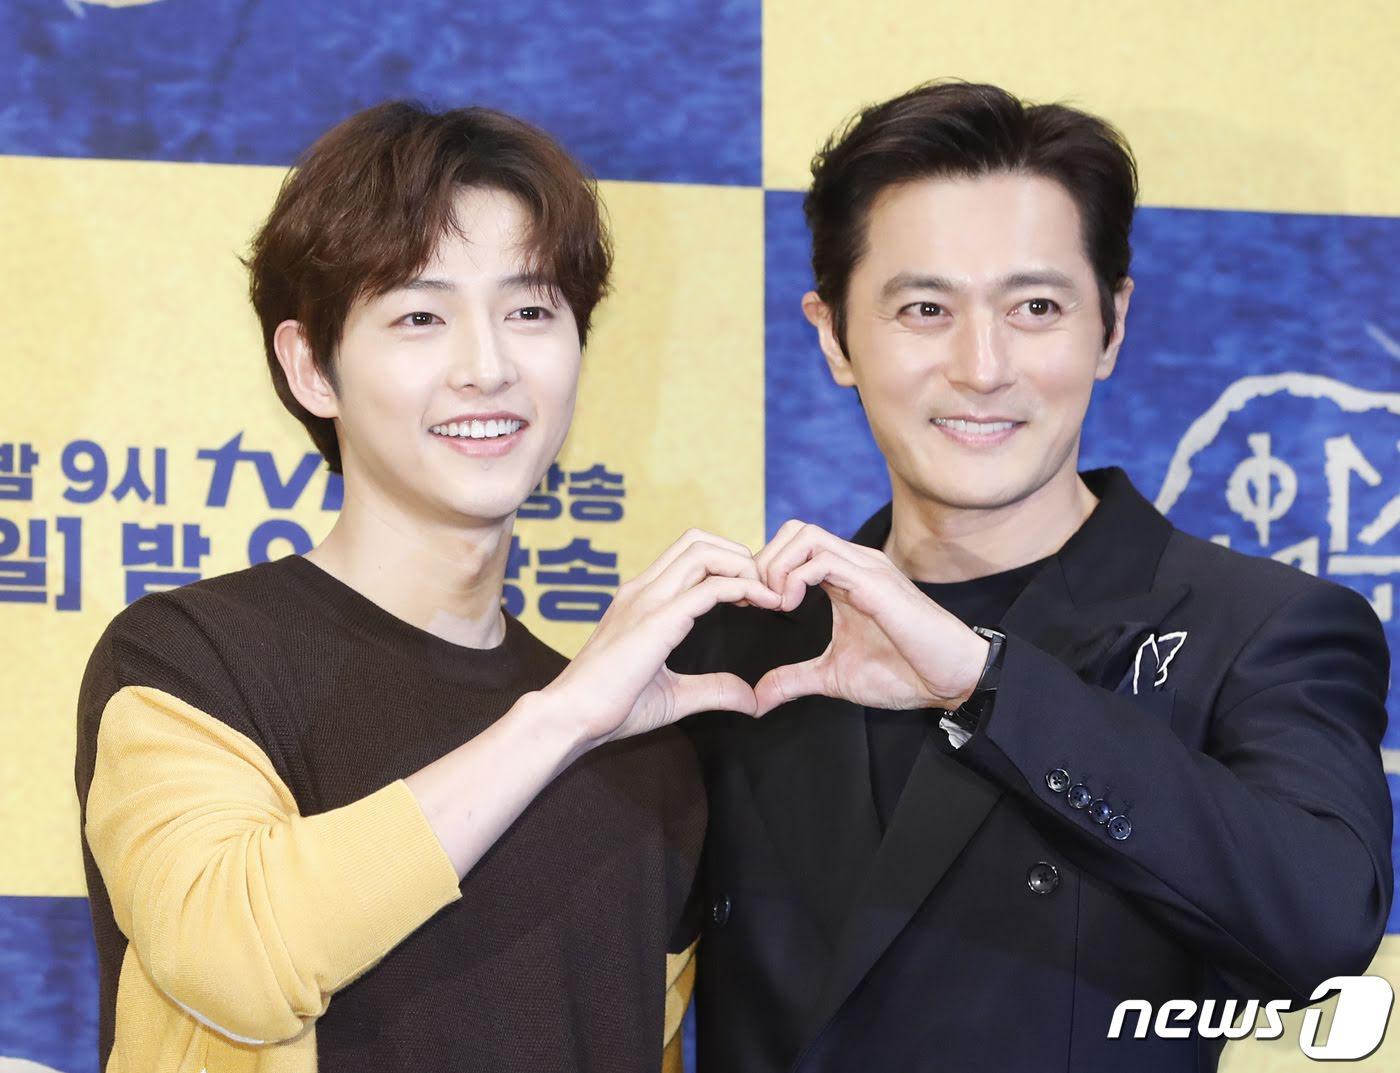 hwang hee song joong ki 7